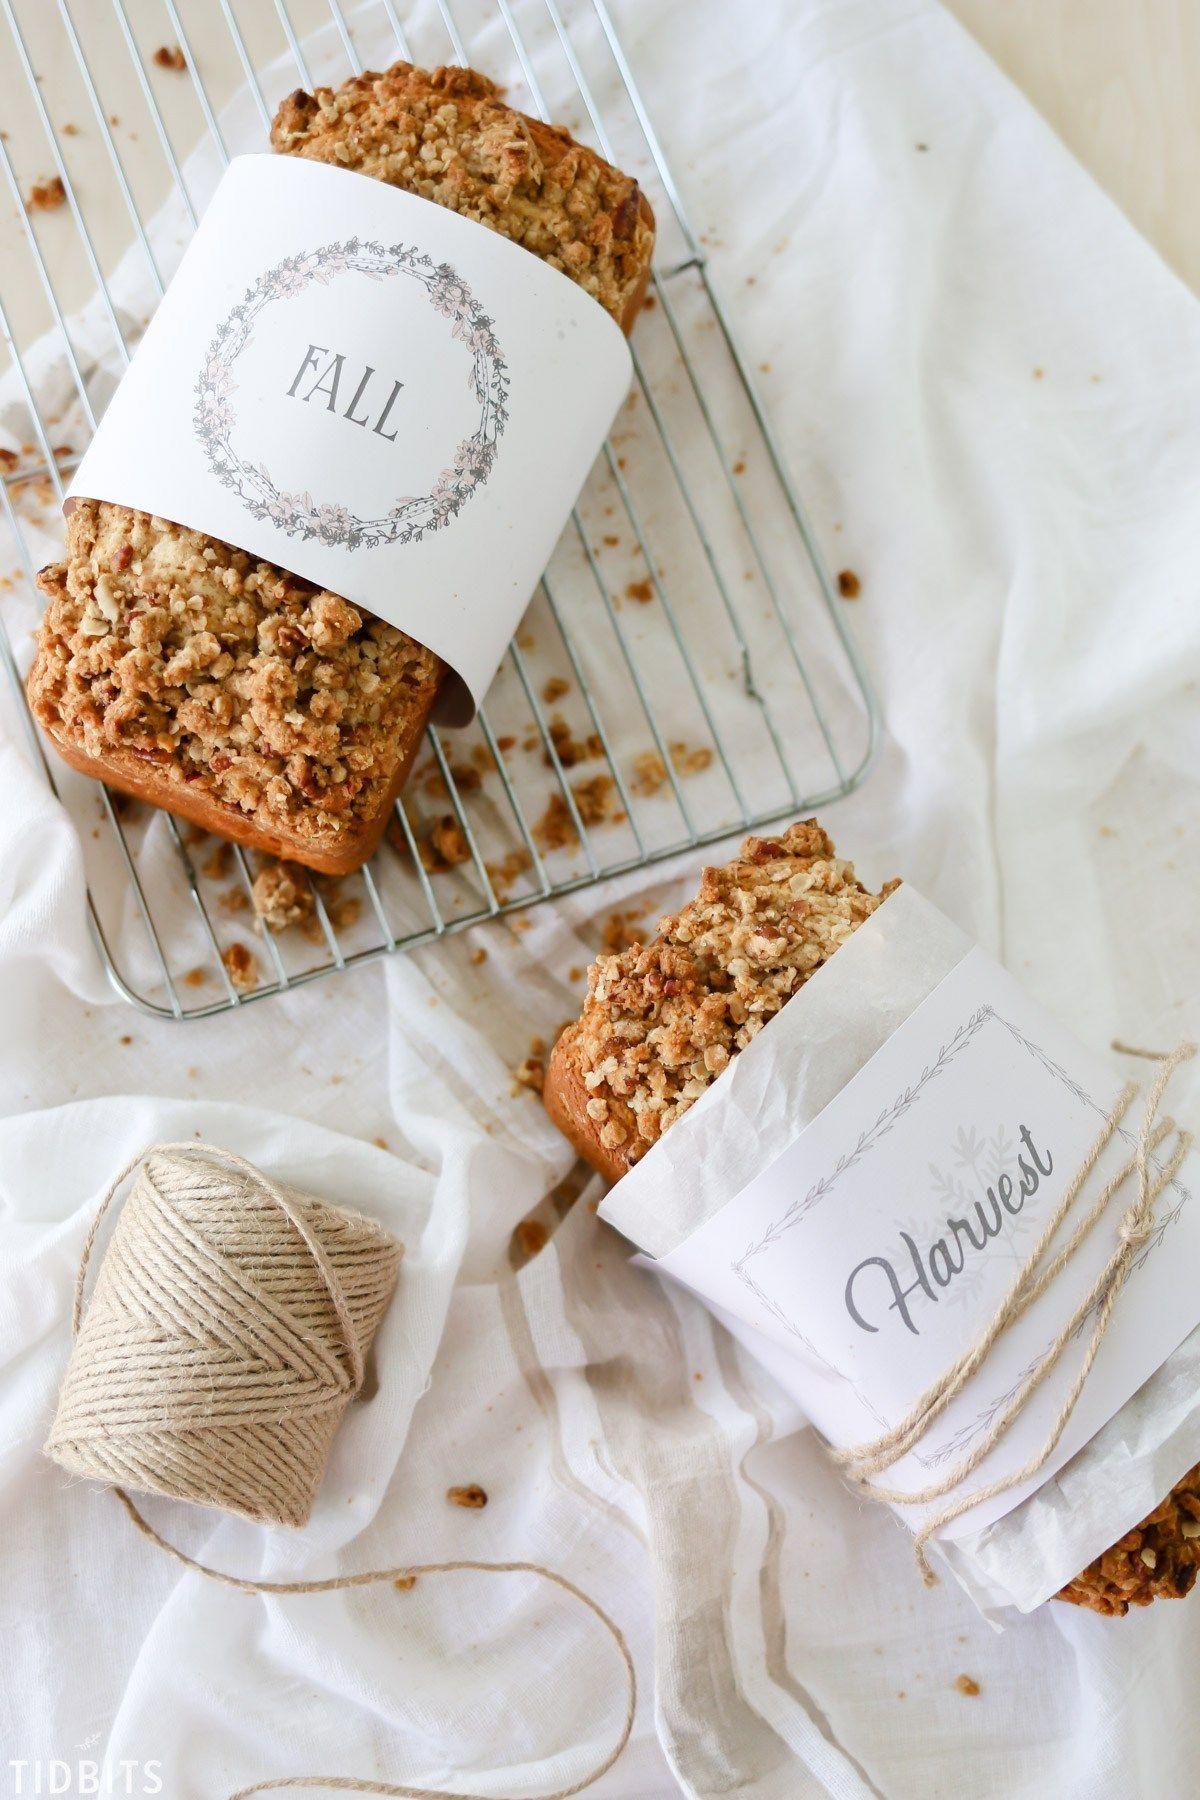 Thanksgiving Table Gift Ideas Autumn Baked Goods